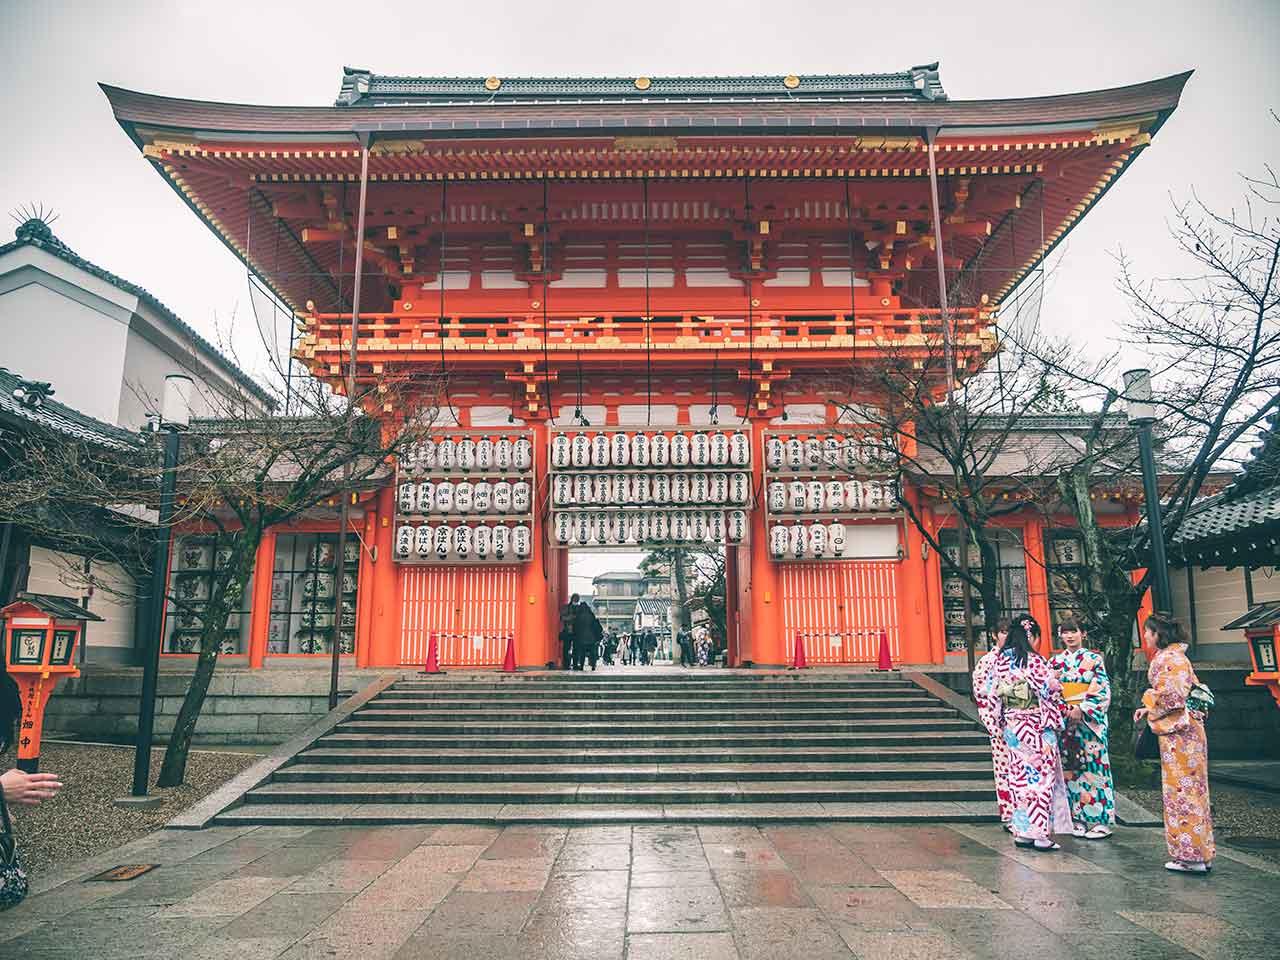 Yasaja Shrine Eingang mit Meikas und Geishas in Kyoto Japan